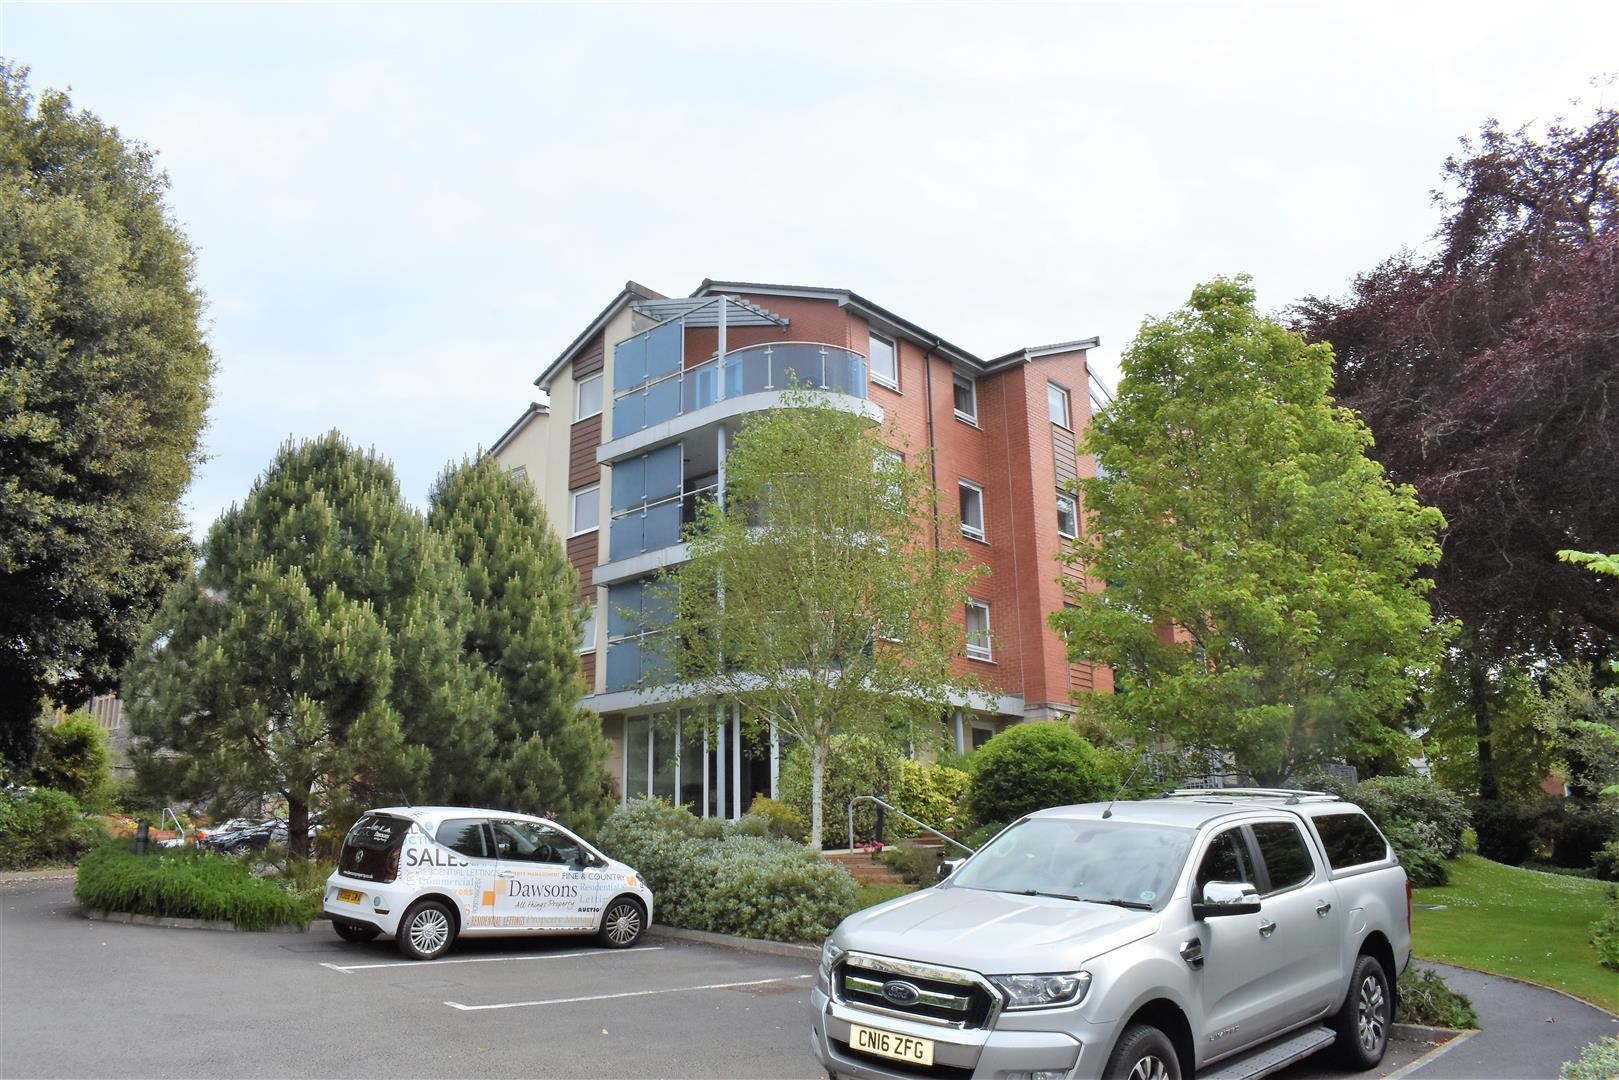 Pantygwydr Court, Sketty, Swansea, SA2 0JA